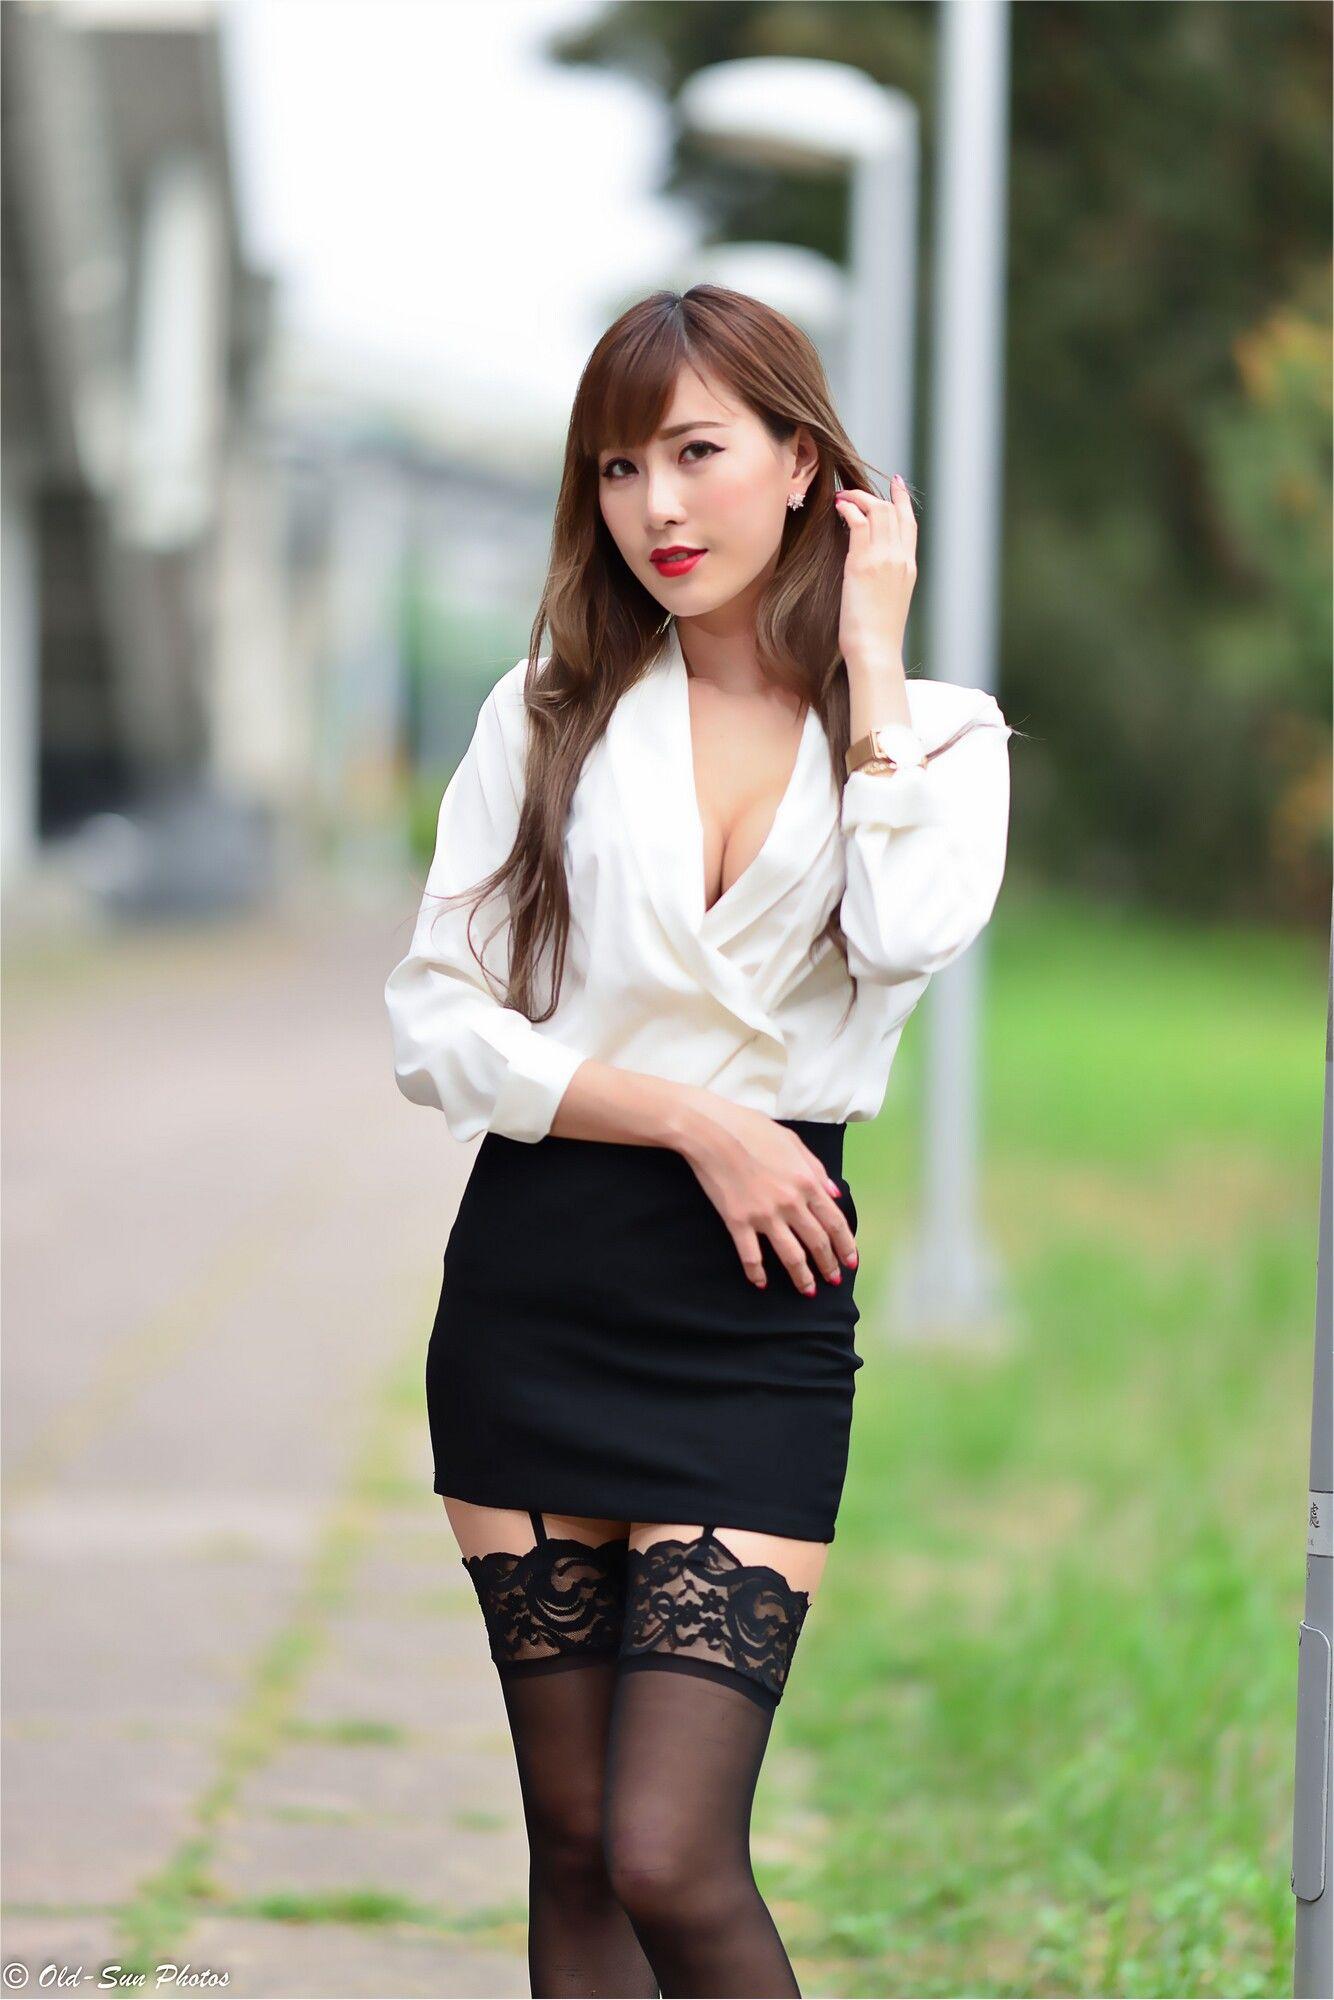 VOL.6 [台湾正妹]丝袜美腿黑丝外拍OL美女:黄艾比(腿模Abbie)超高清个人性感漂亮大图(120P)